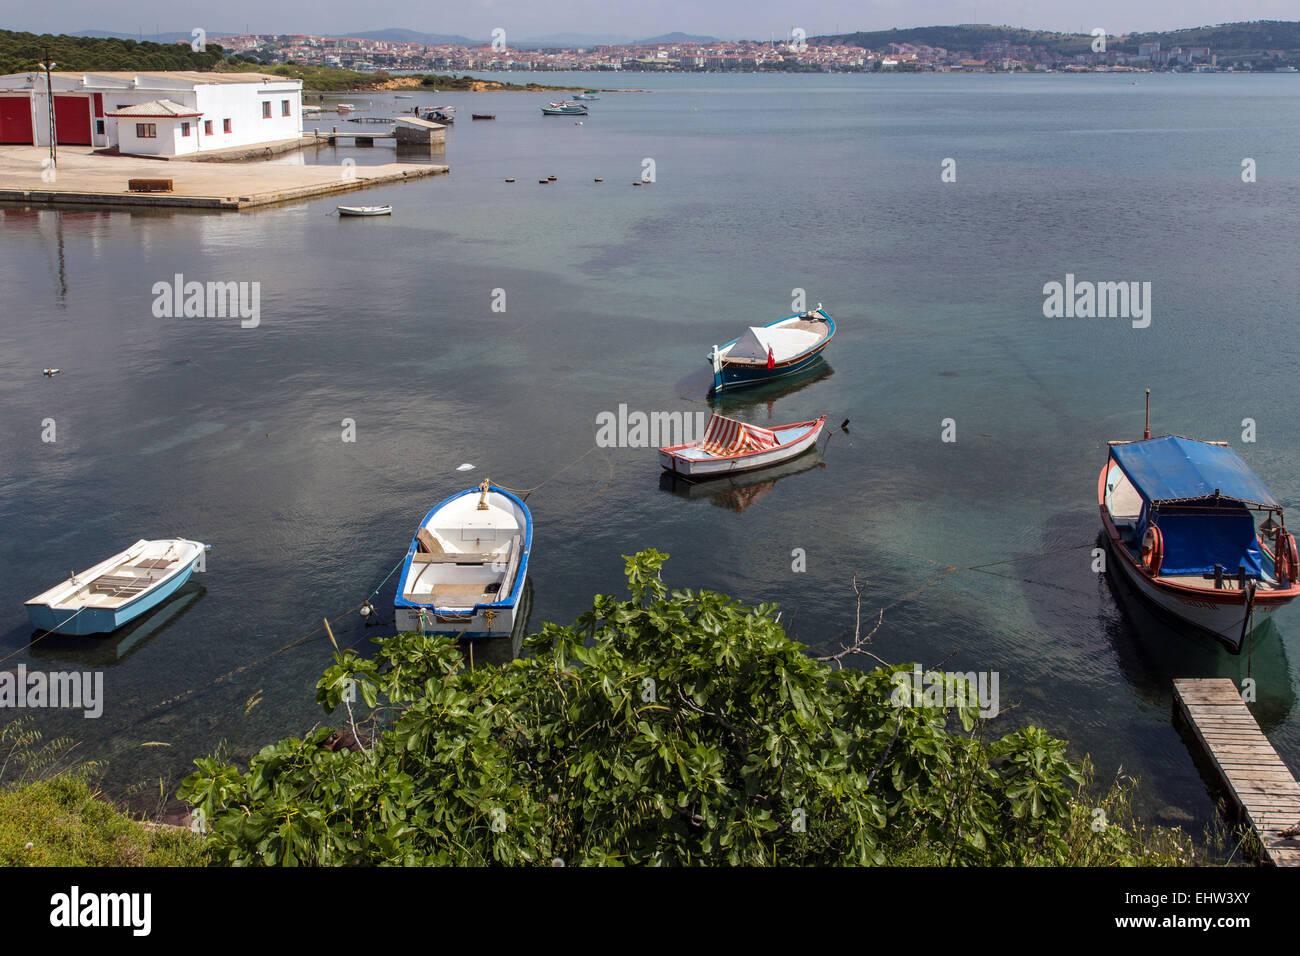 THE OLIVE RIVIERA, AEGEAN SEA, TURKEY - Stock Image